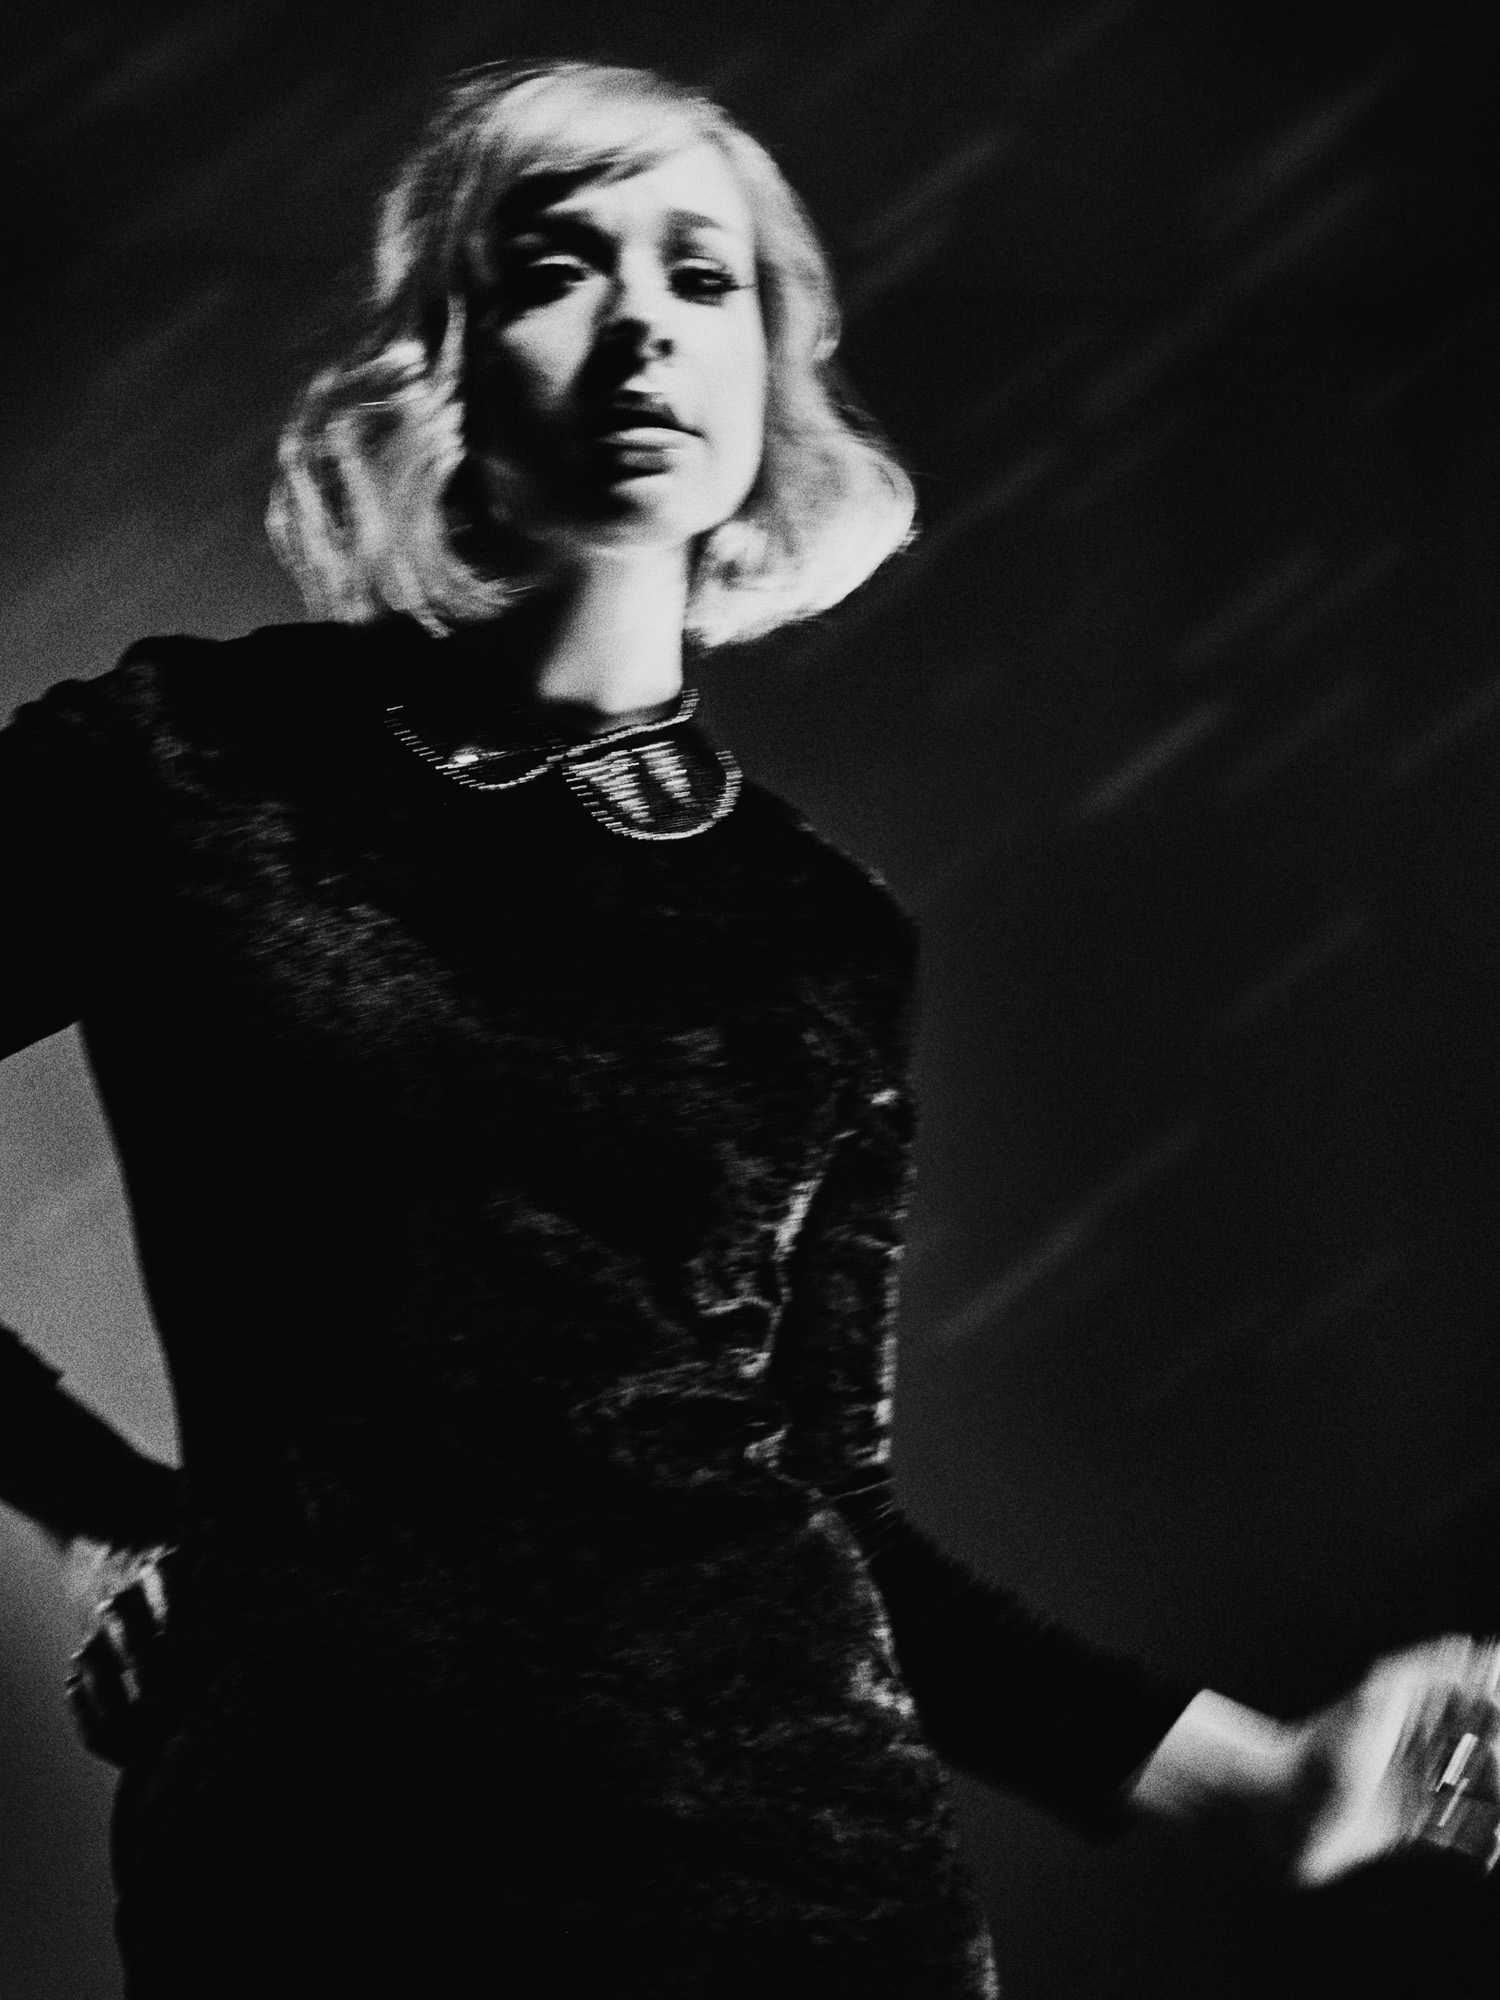 lianna-noir-portrait-tim-ilskens-2.jpg